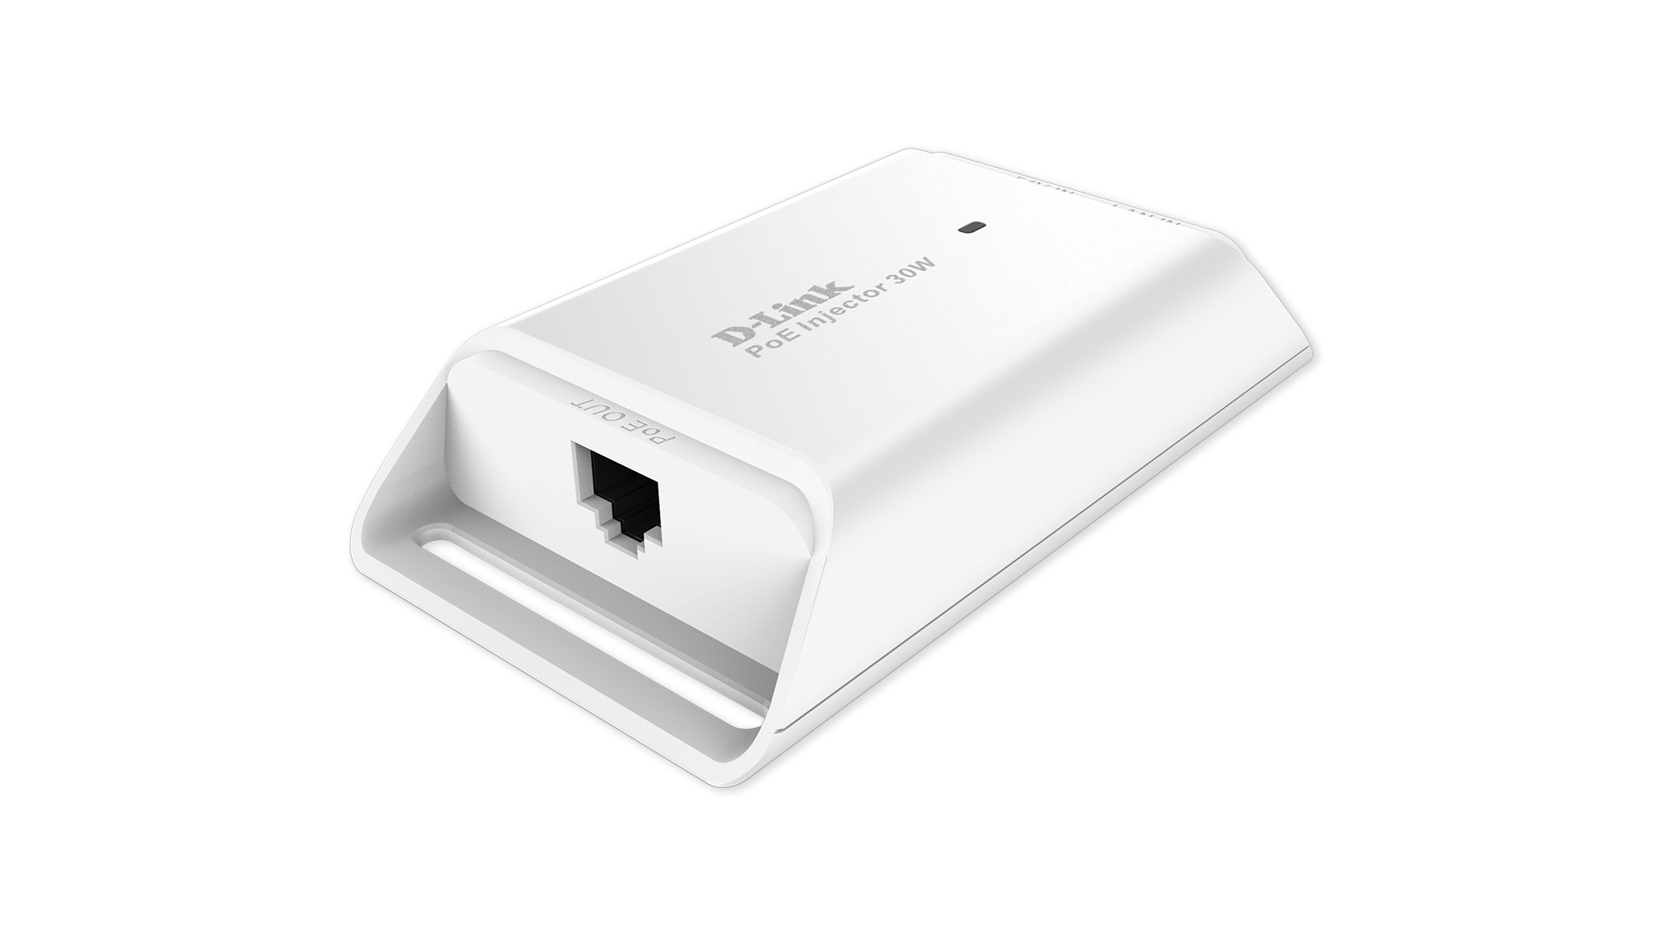 D-Link DPE-301GI PoE adapter